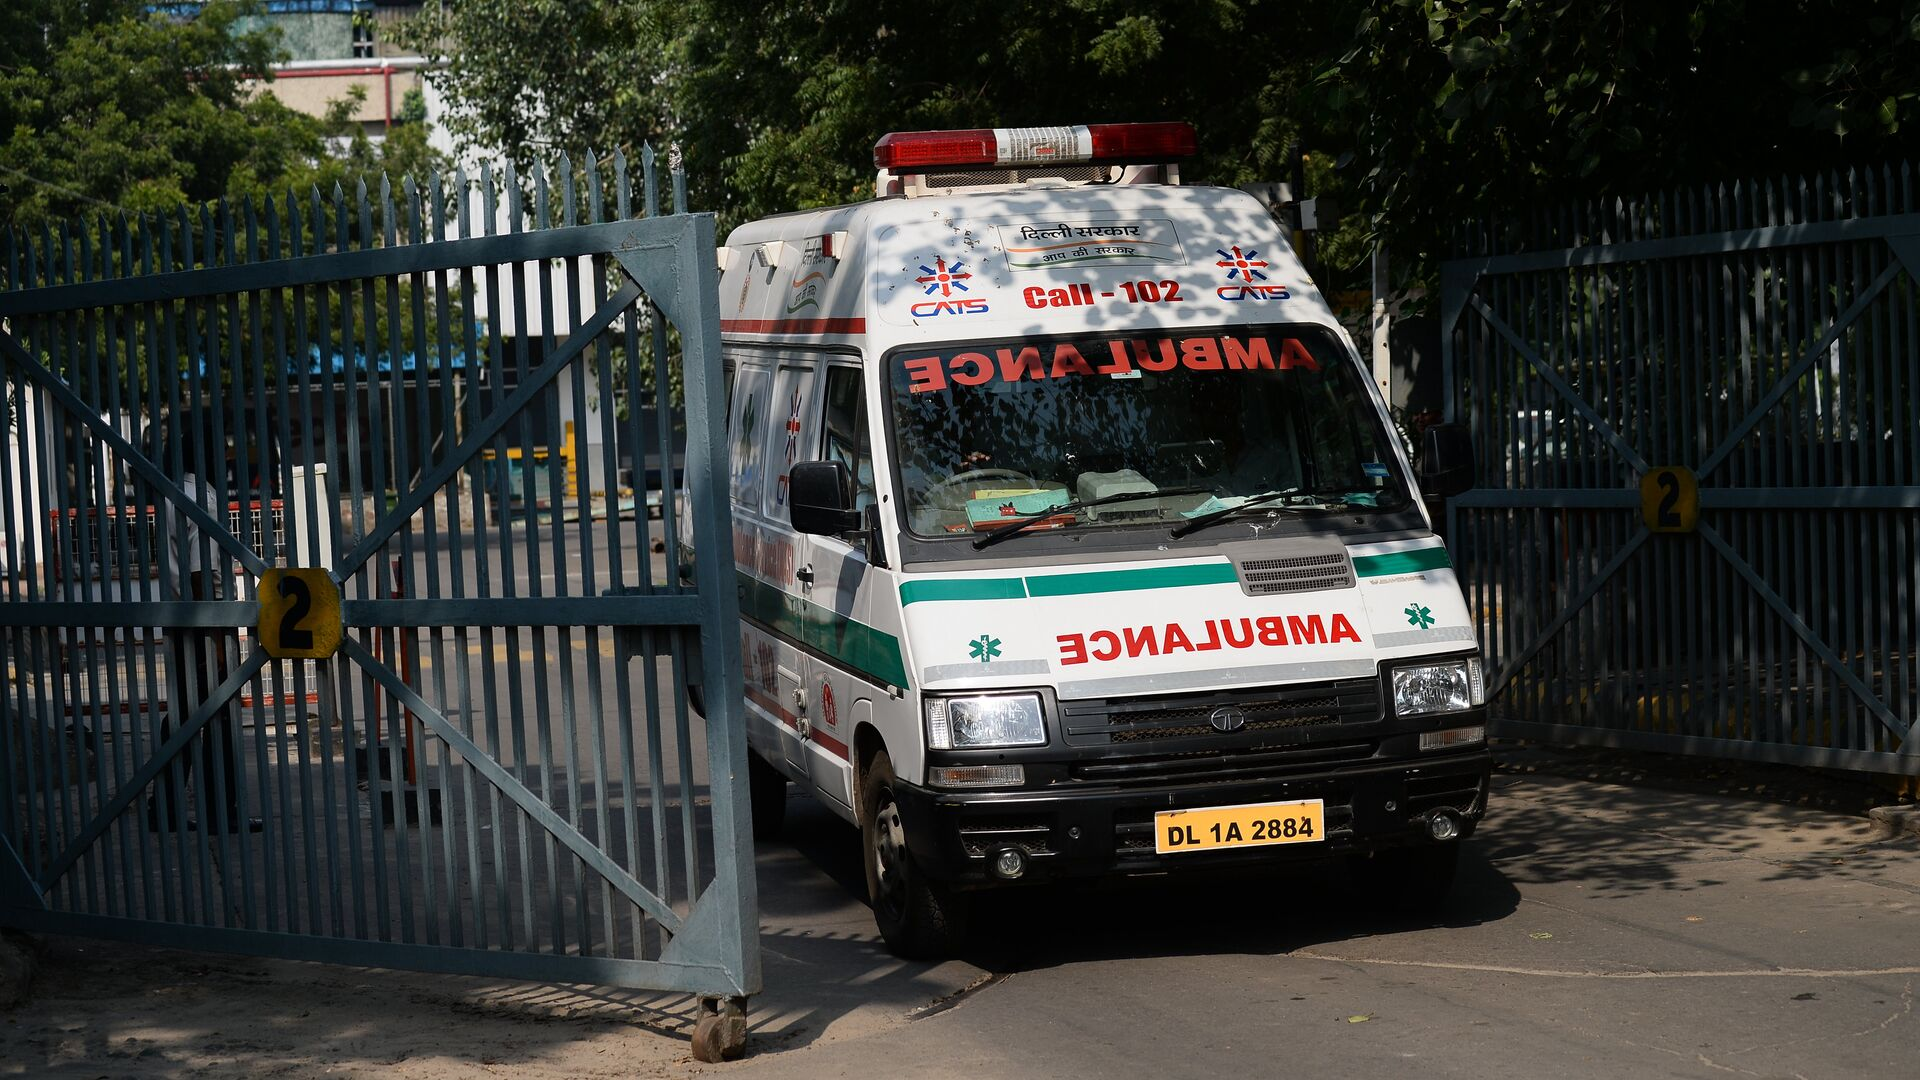 India Ambulance - Sputnik International, 1920, 28.07.2021